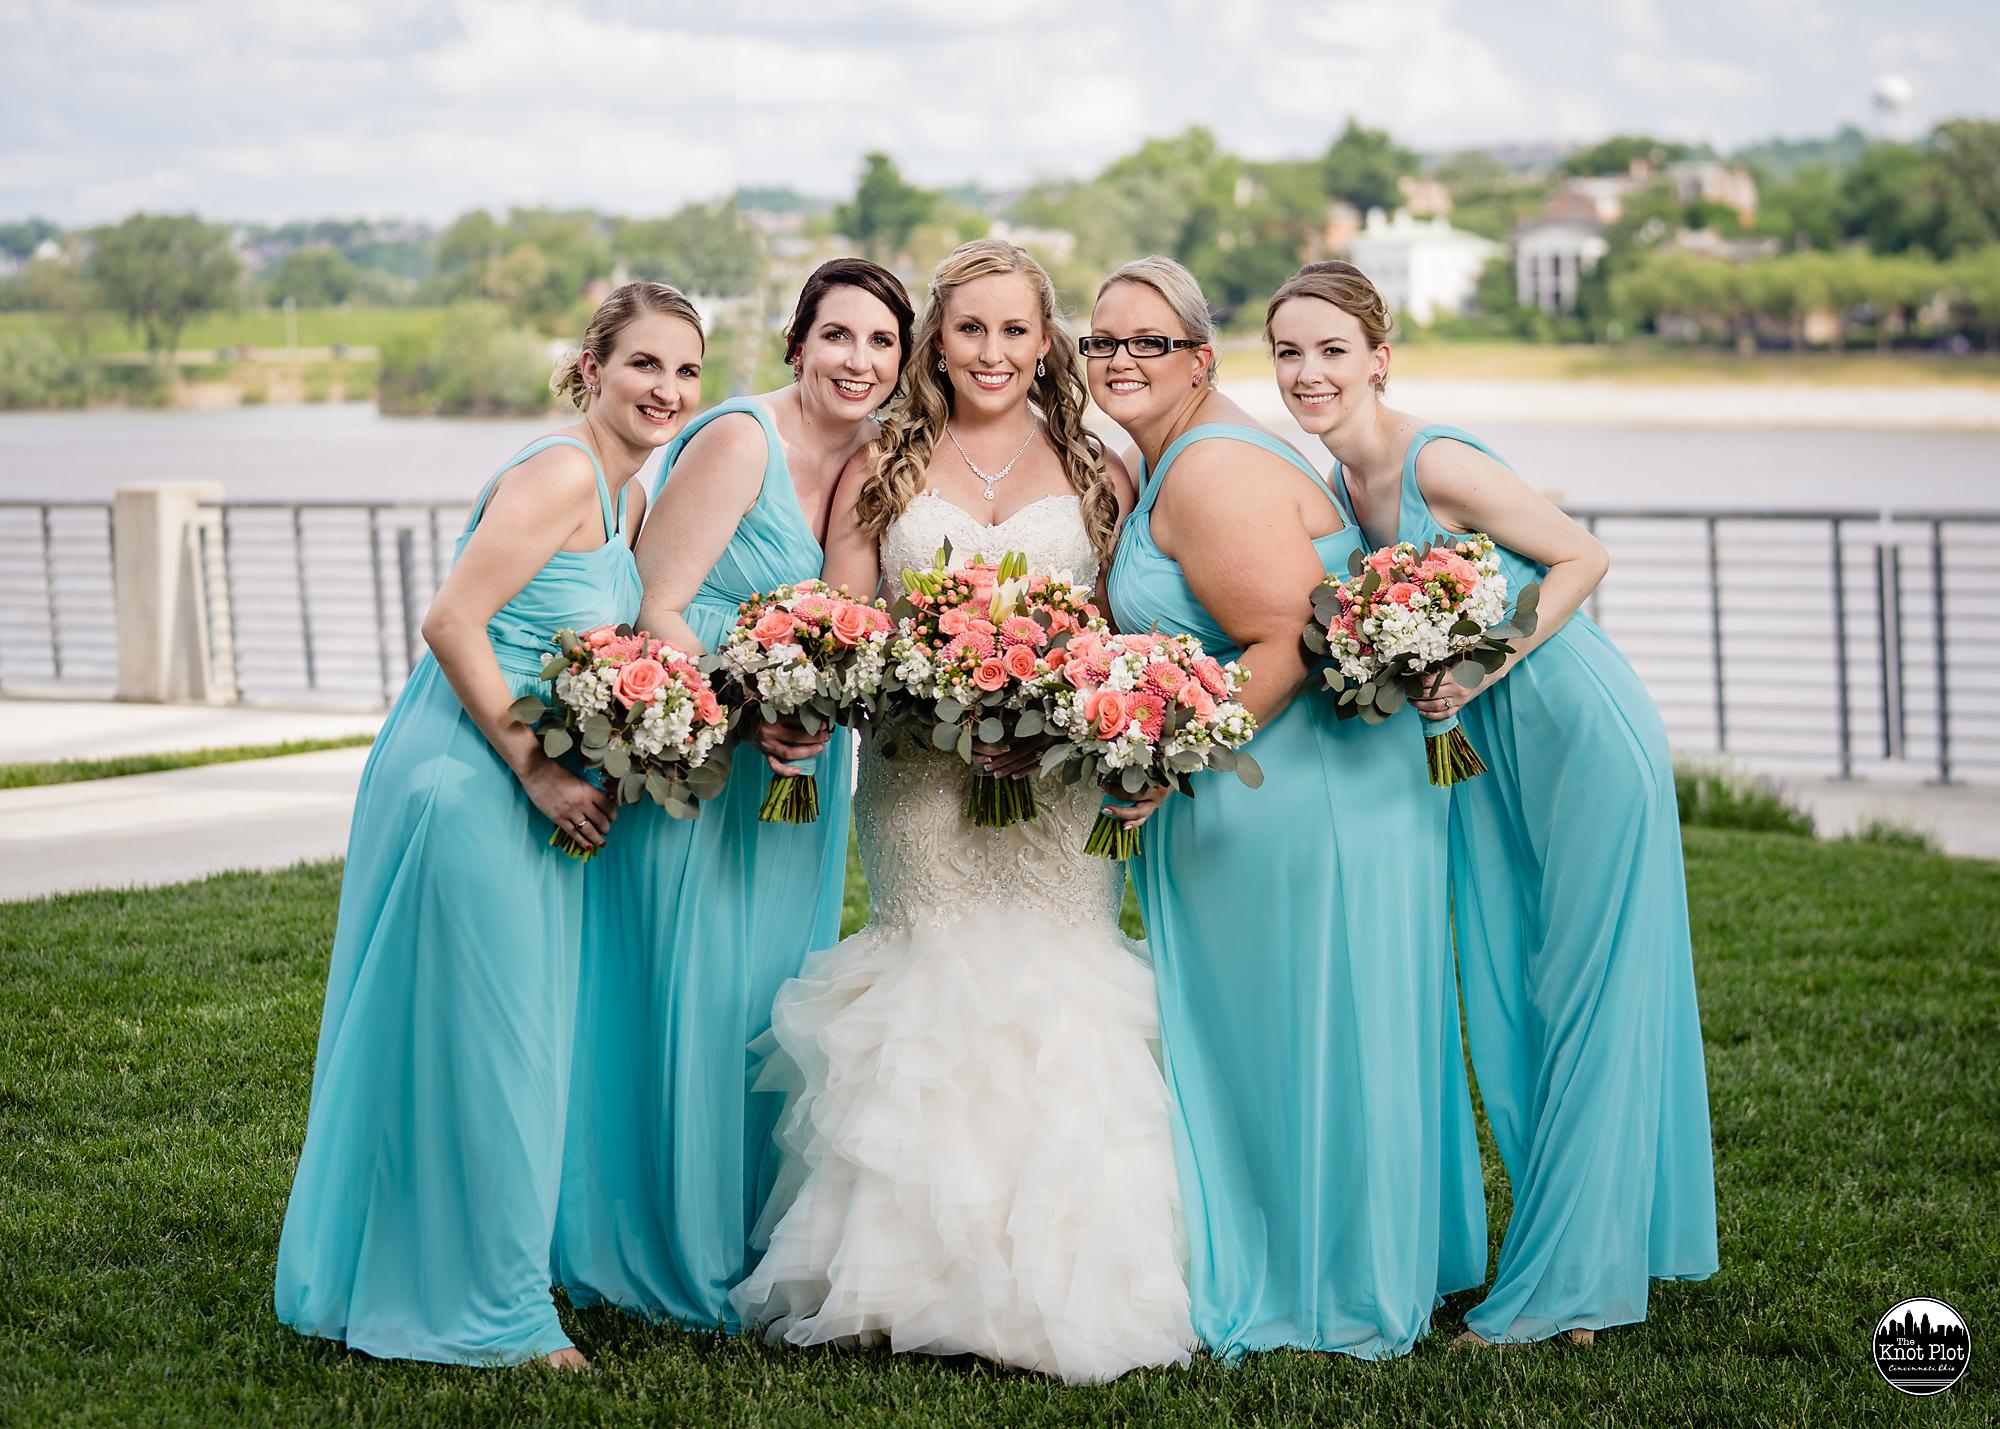 Newport-Aquarium-Wedding-Photos-7.jpg